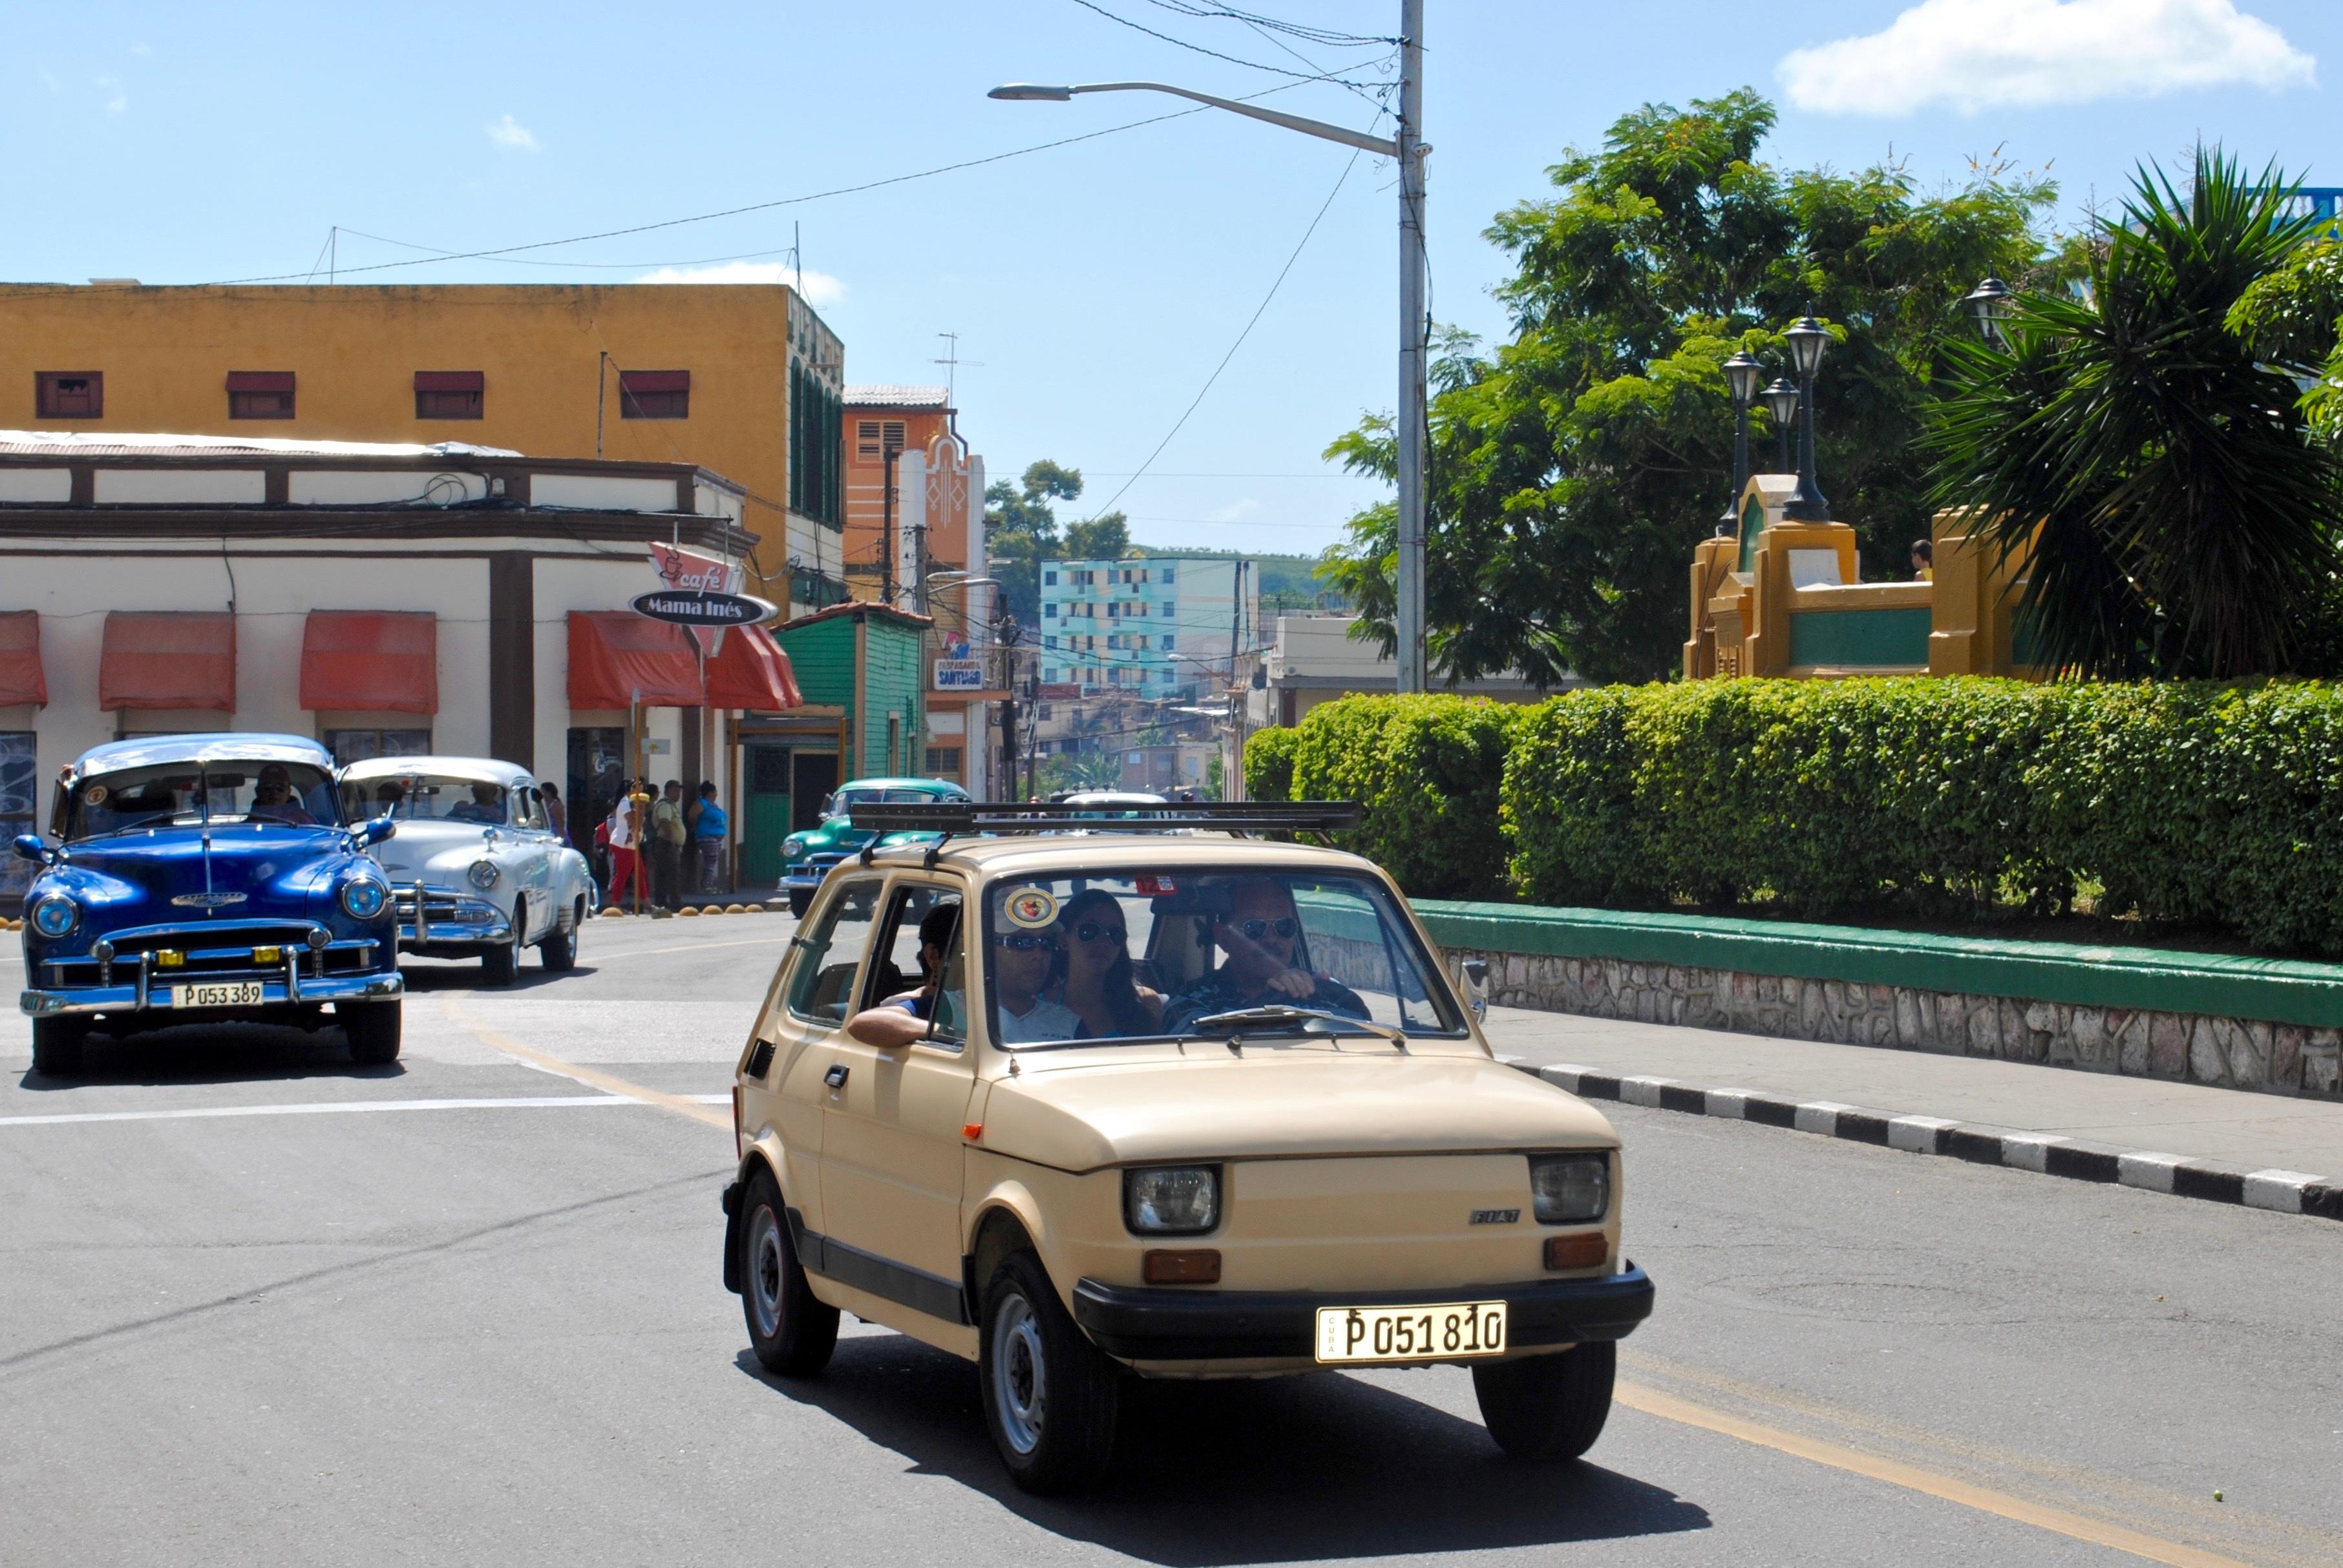 Free Images : street, vintage, retro, taxi, transportation ...